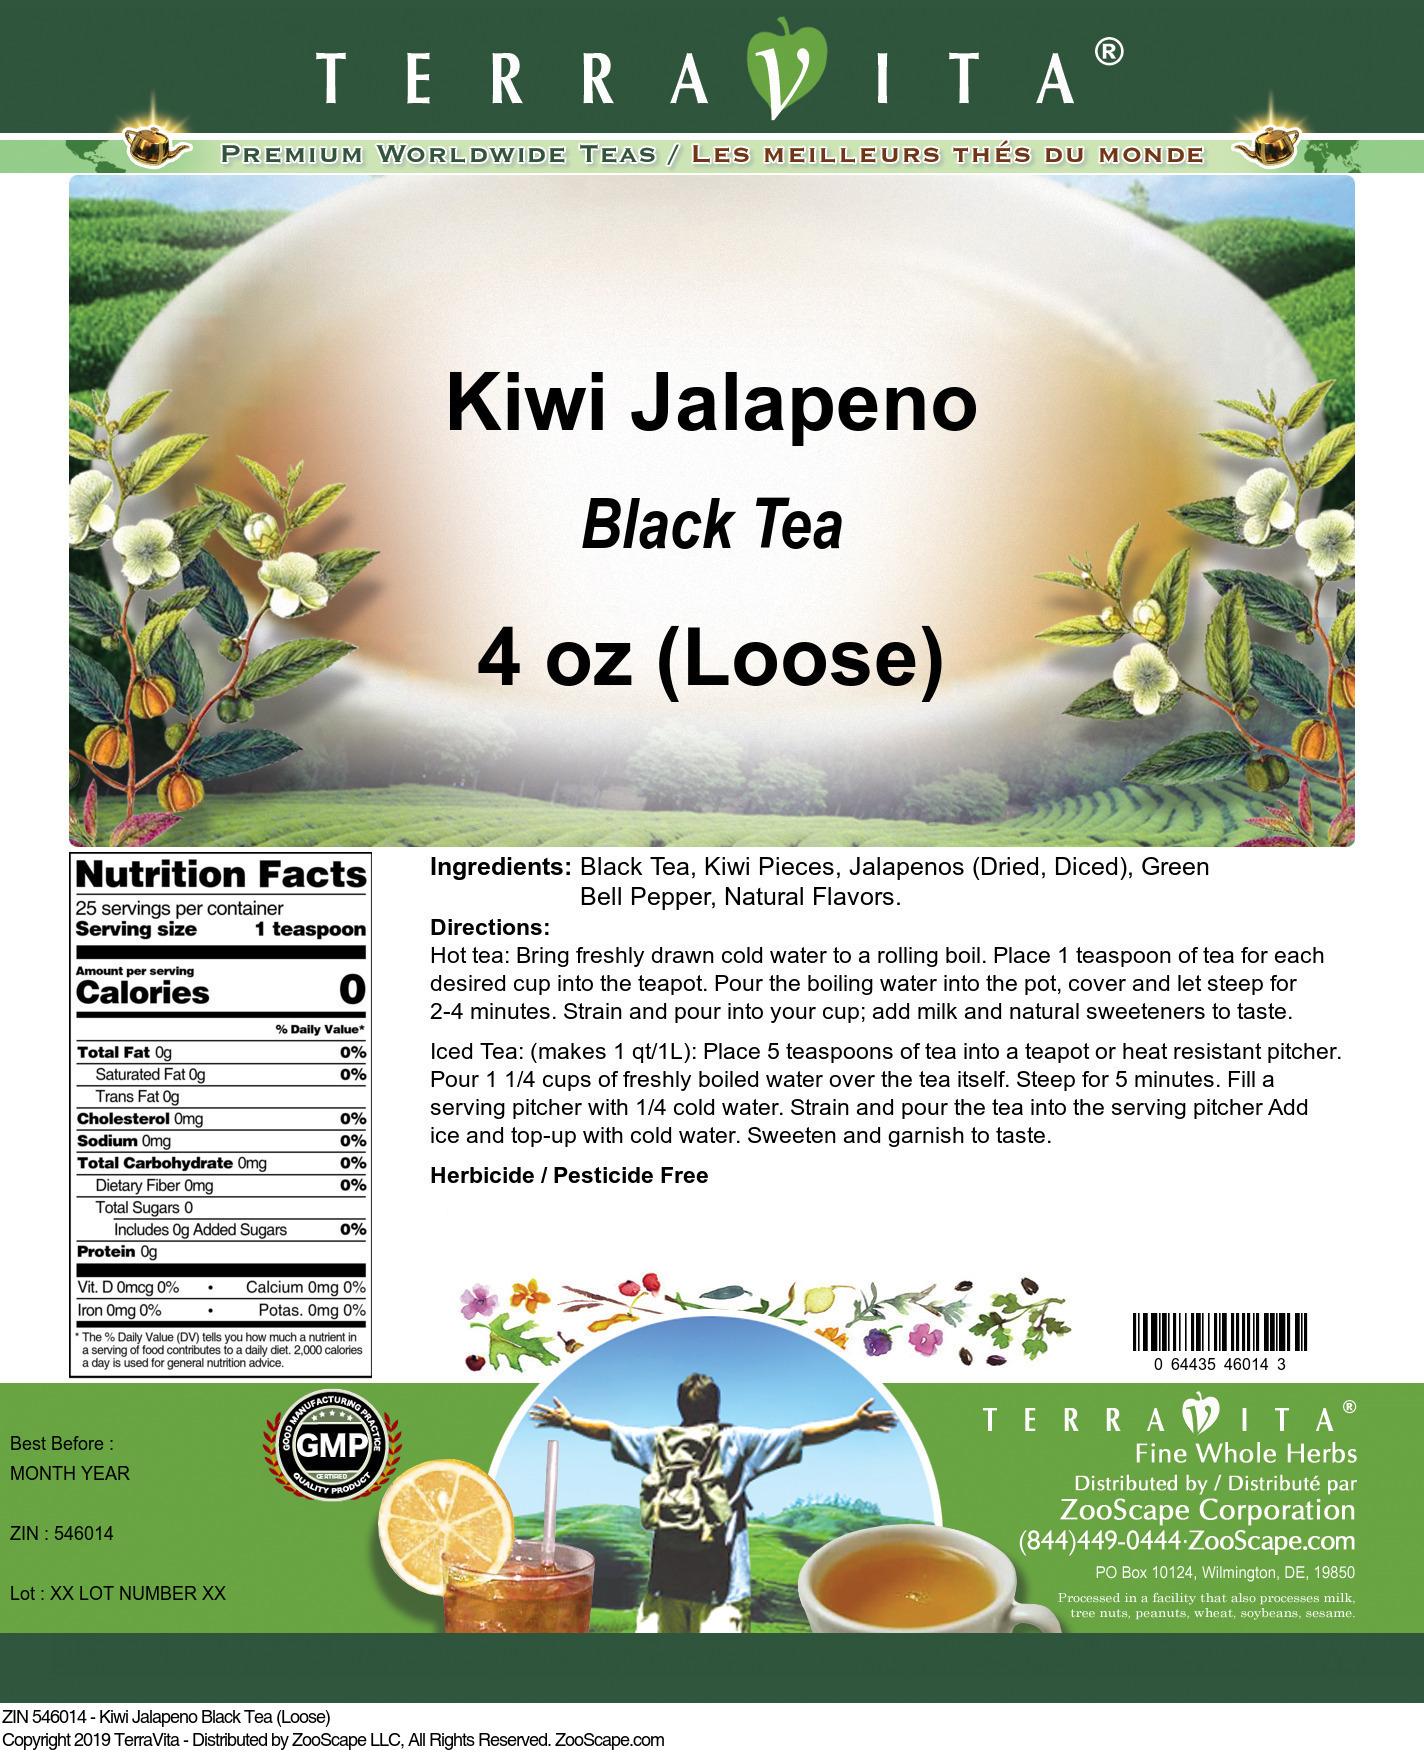 Kiwi Jalapeno Black Tea (Loose)